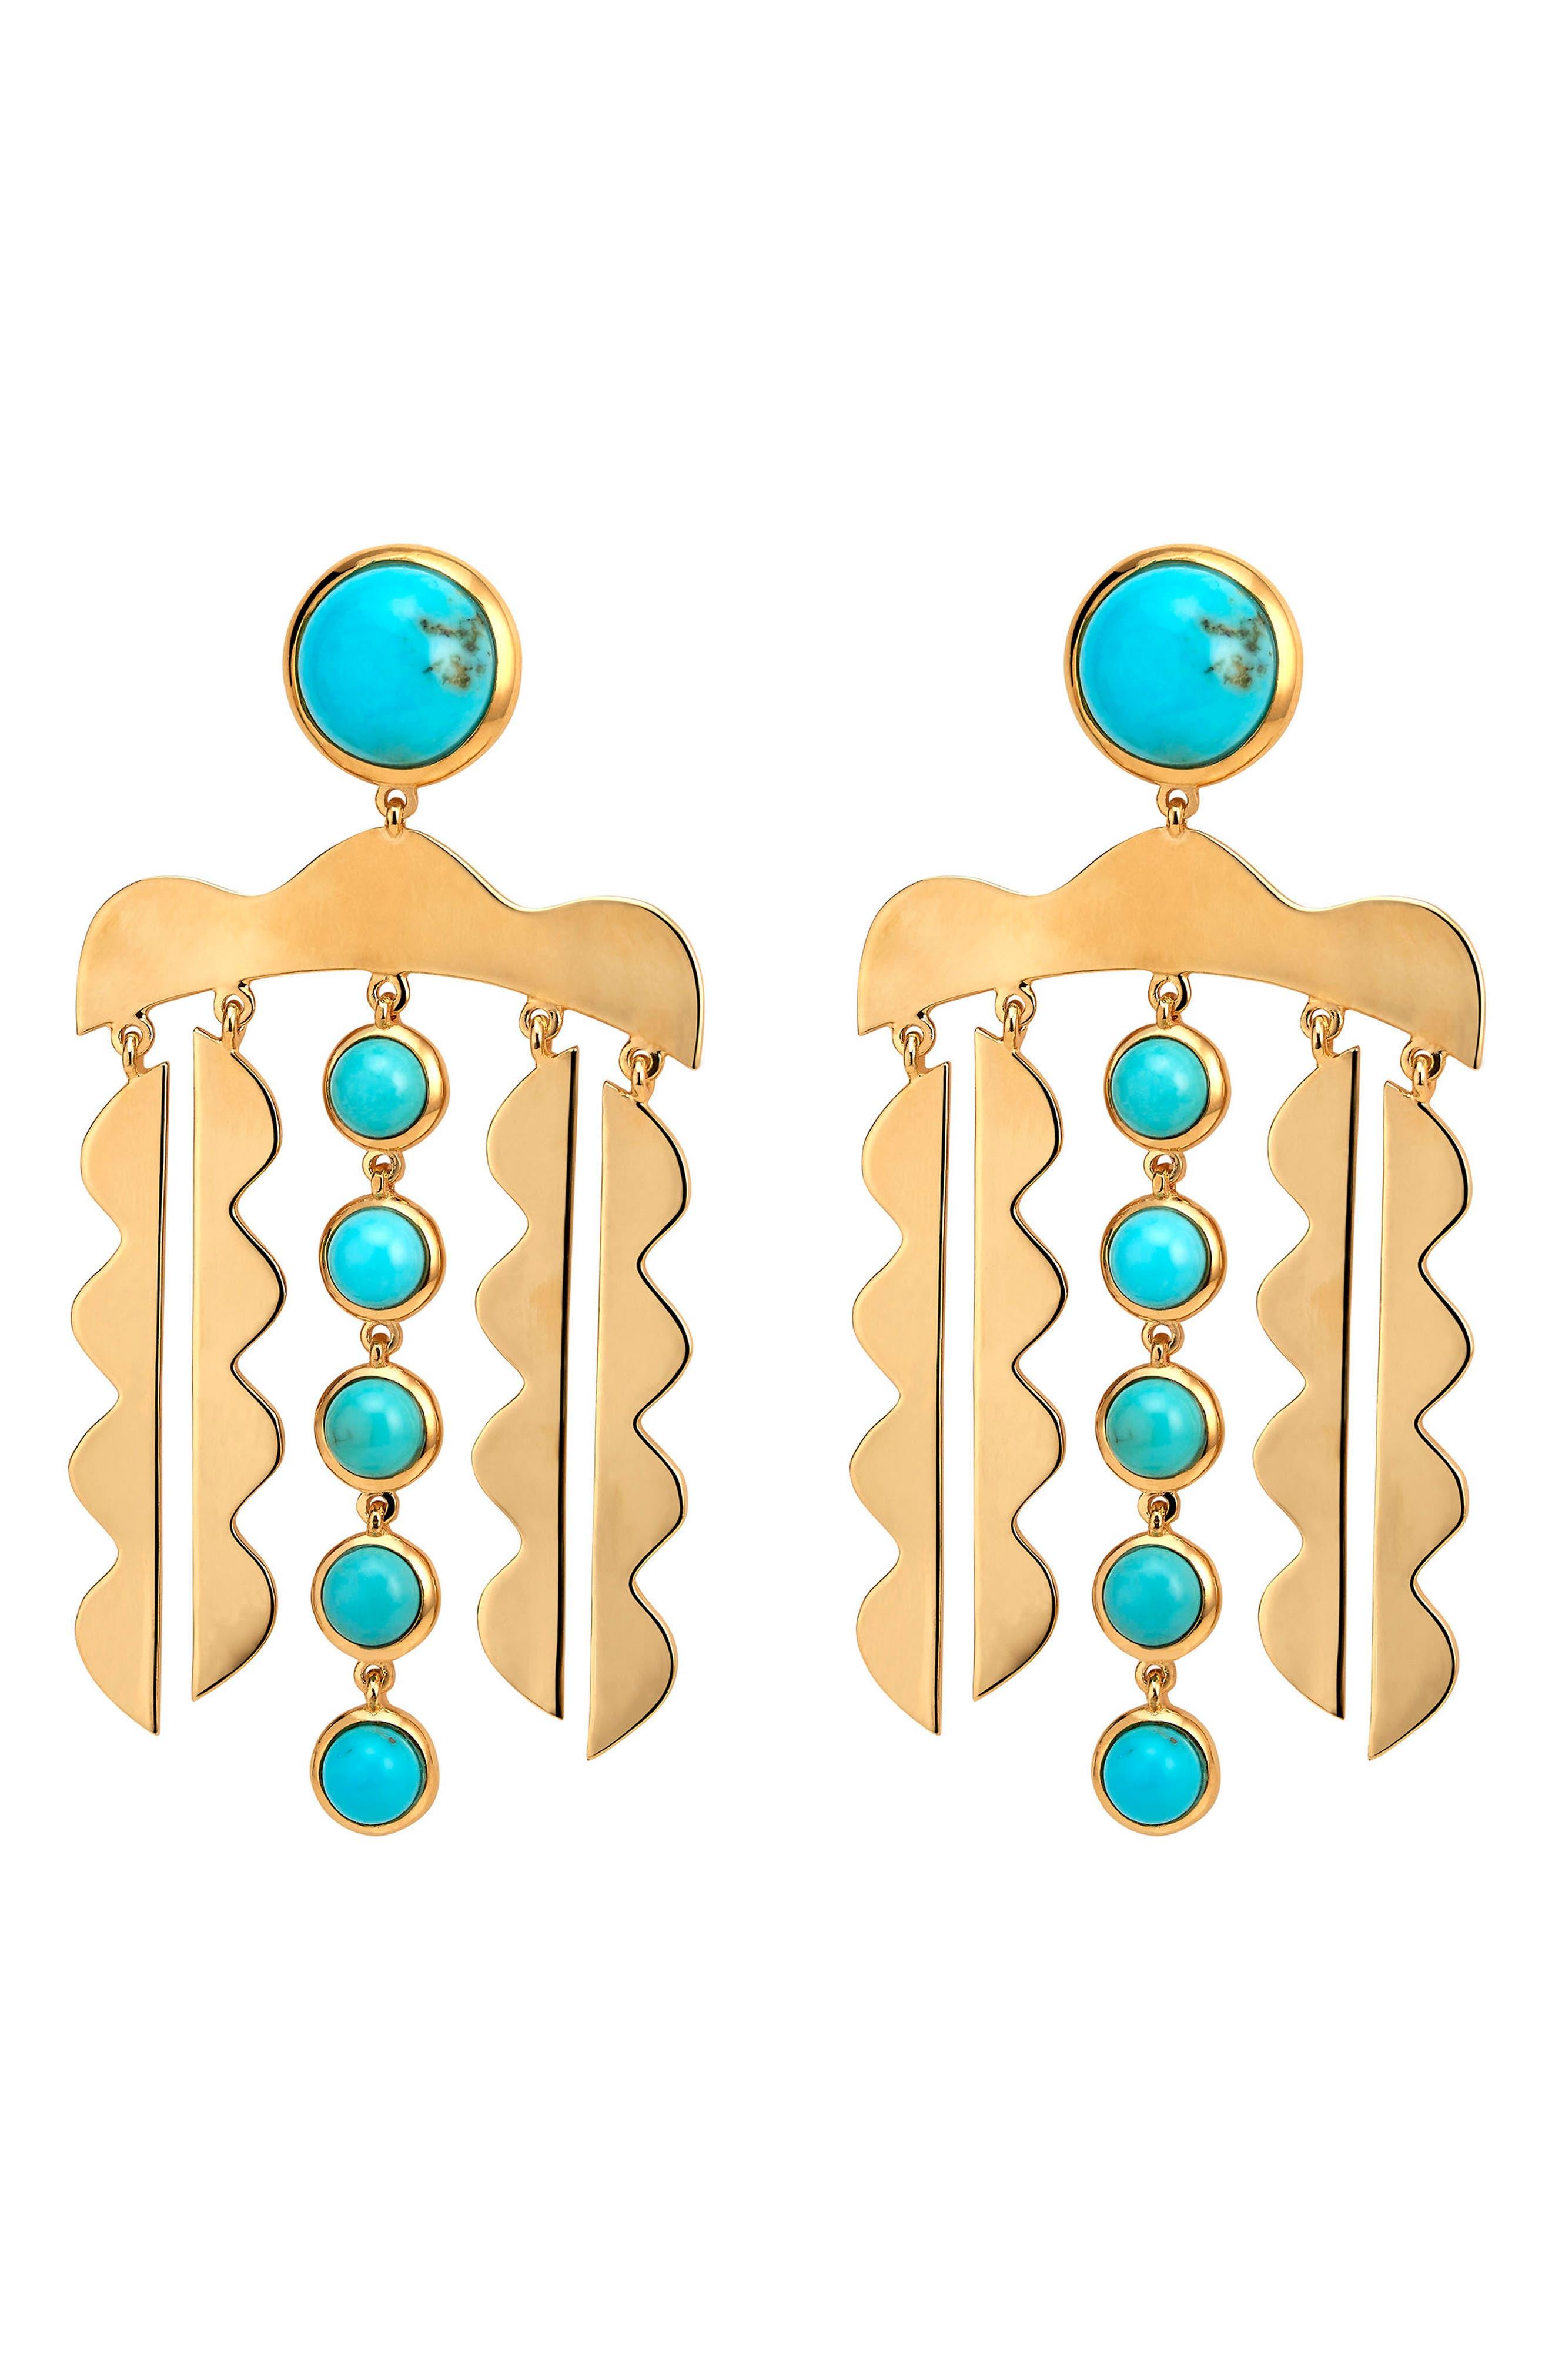 Mustique Chandelier Drop Earrings,                         Main,                         color, TURQUOISE/ GOLD